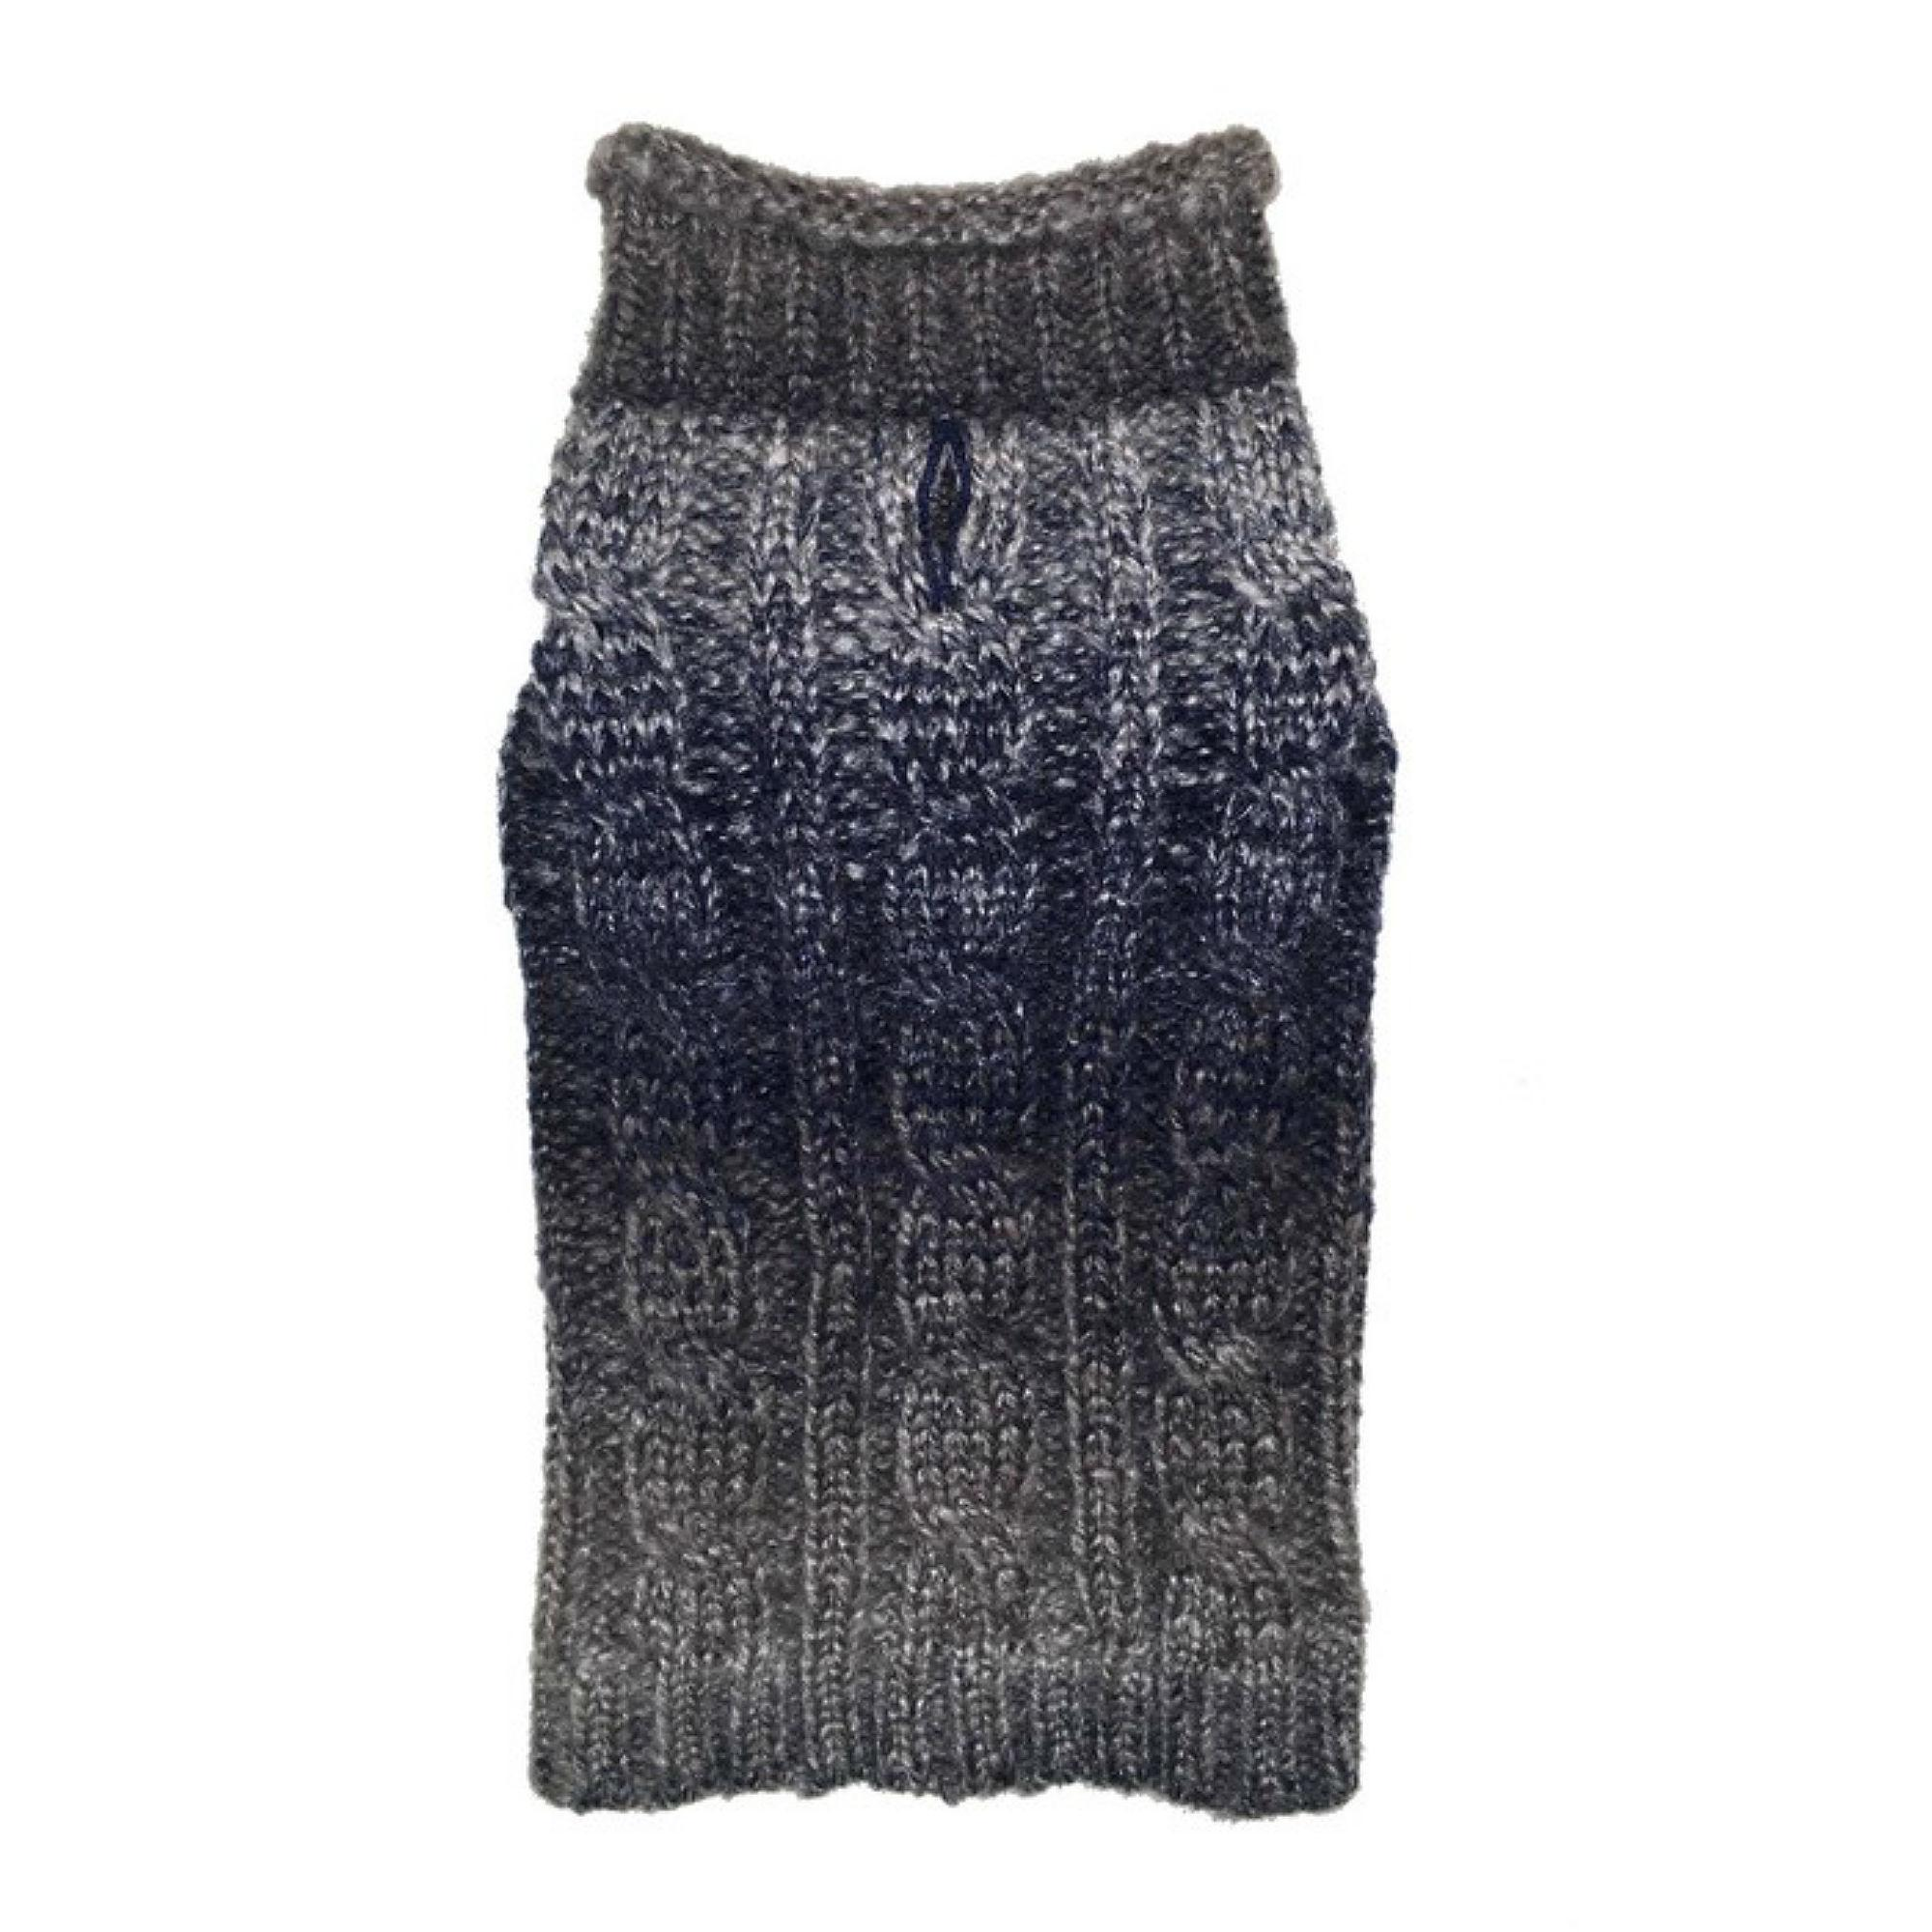 fabdog® Ombre Rollneck Dog Sweater - Blue